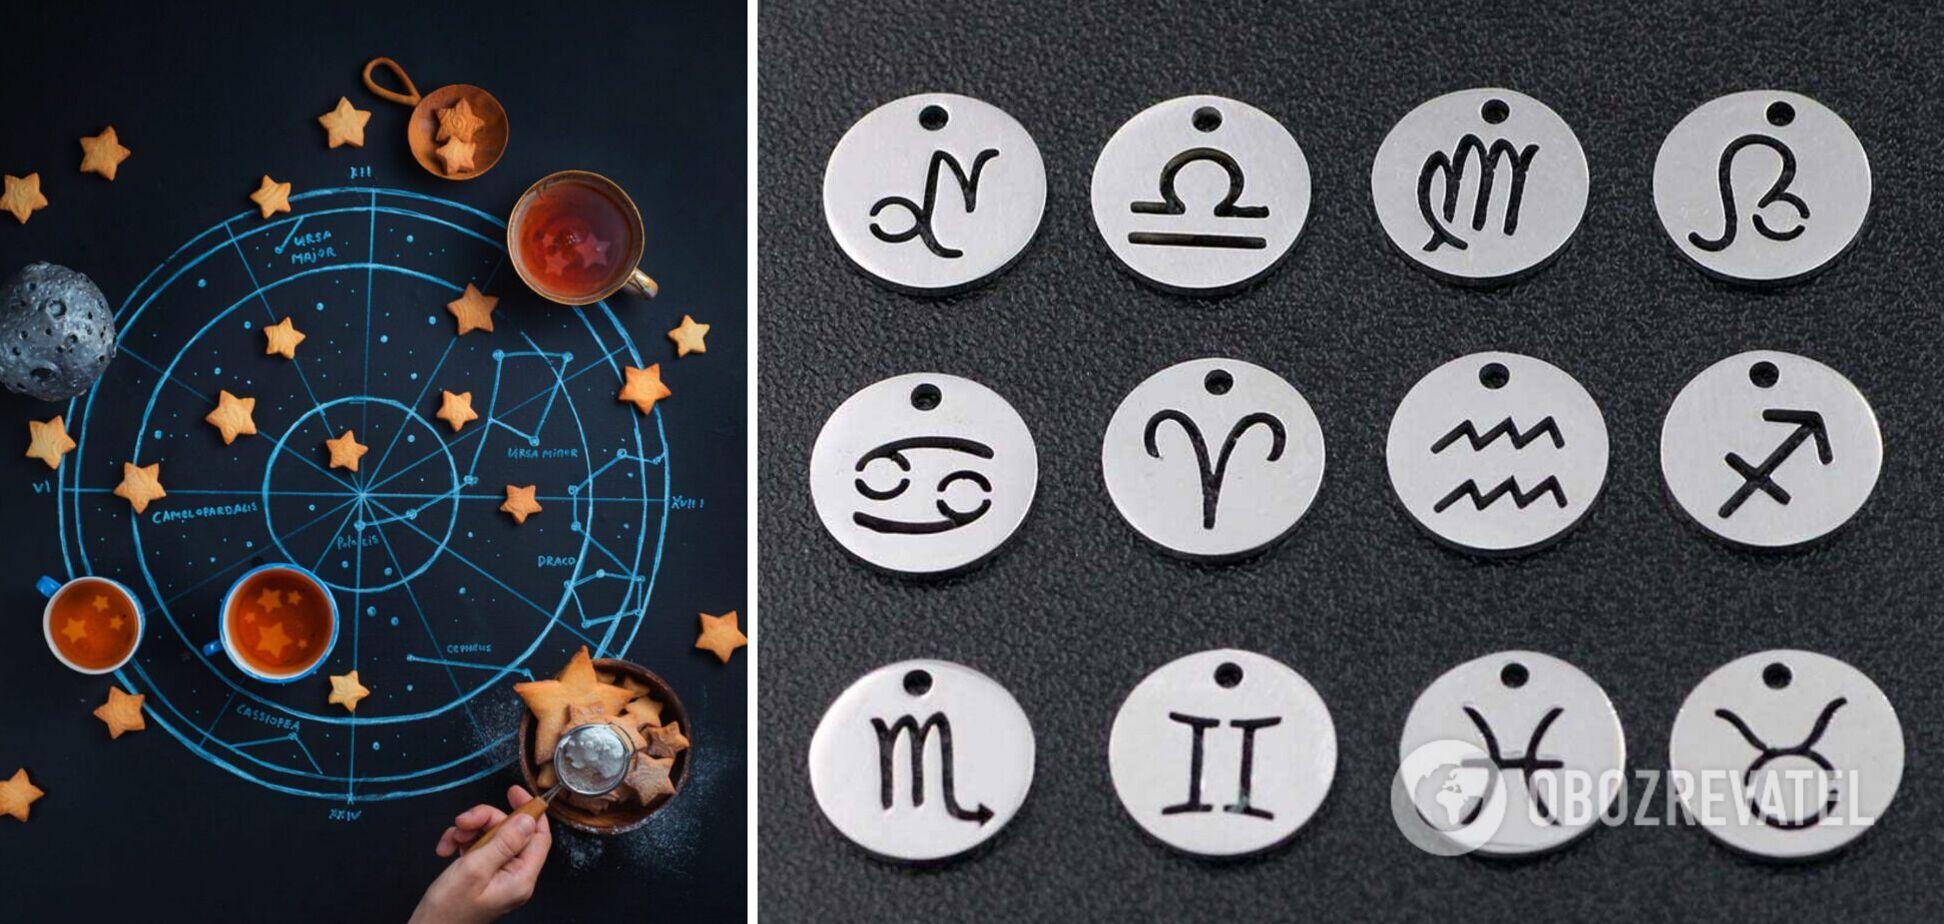 Гороскоп таро на 10-16 мая для всех знаков зодиака